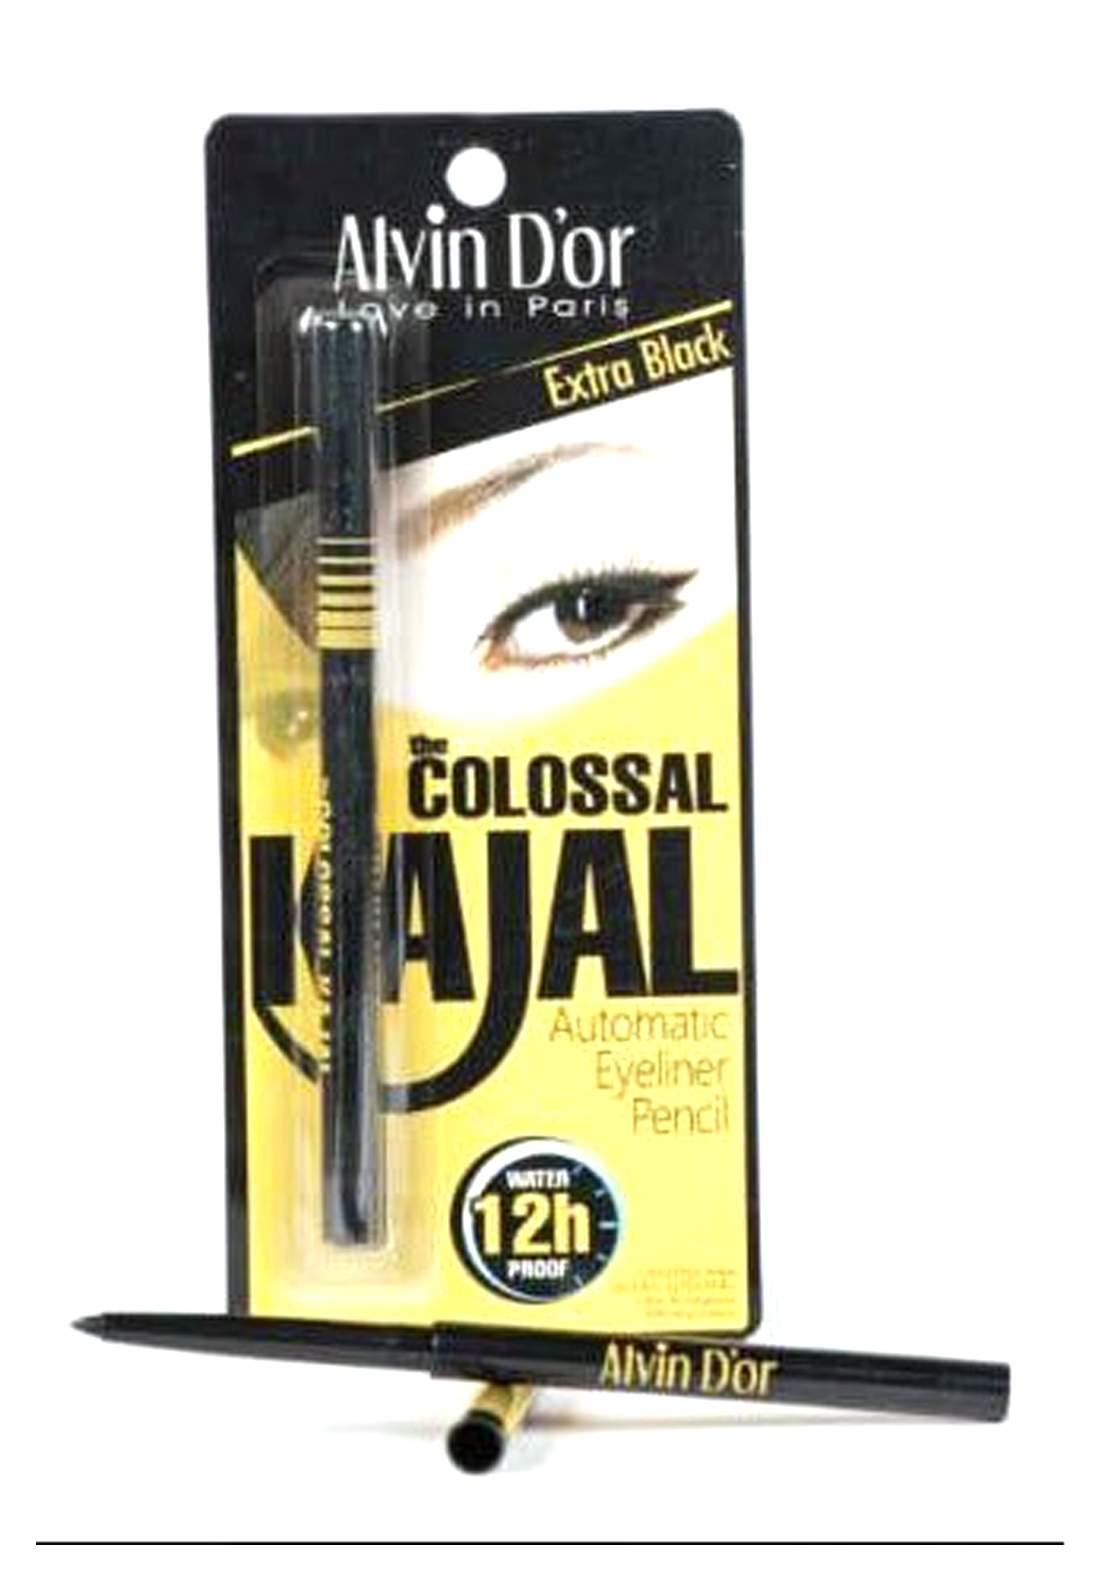 Alvin D'or Colossal Kajal Eyeliner12 H قلم تحديد العيون